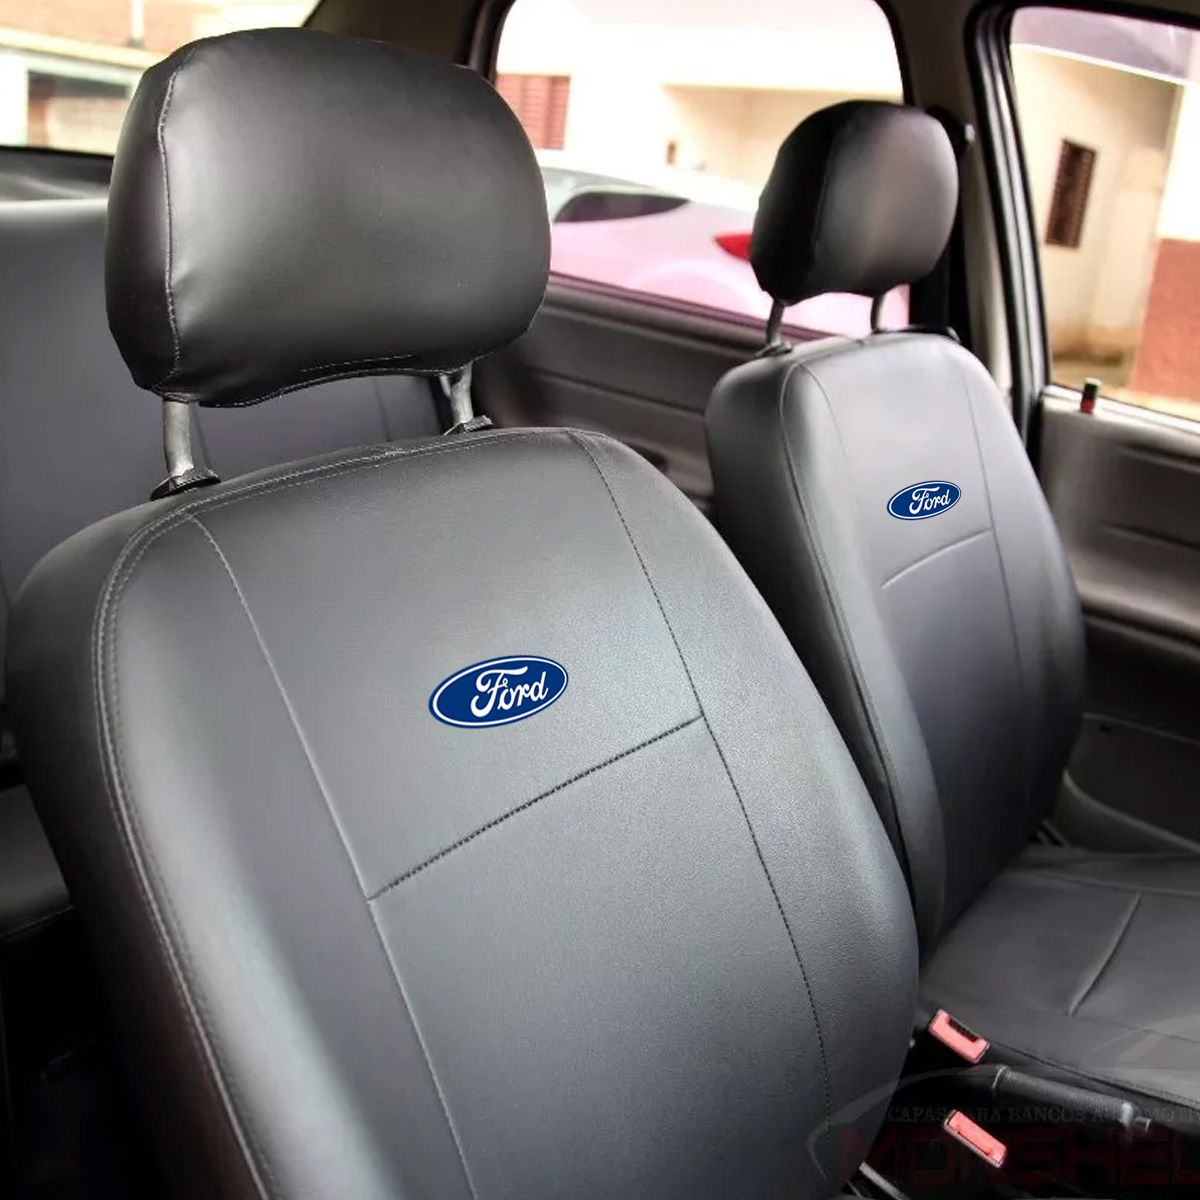 Capa de Banco Ford Ka Fiesta Ecosport Escort F250 F100 Couro Bordado Todos Ford Poliparts